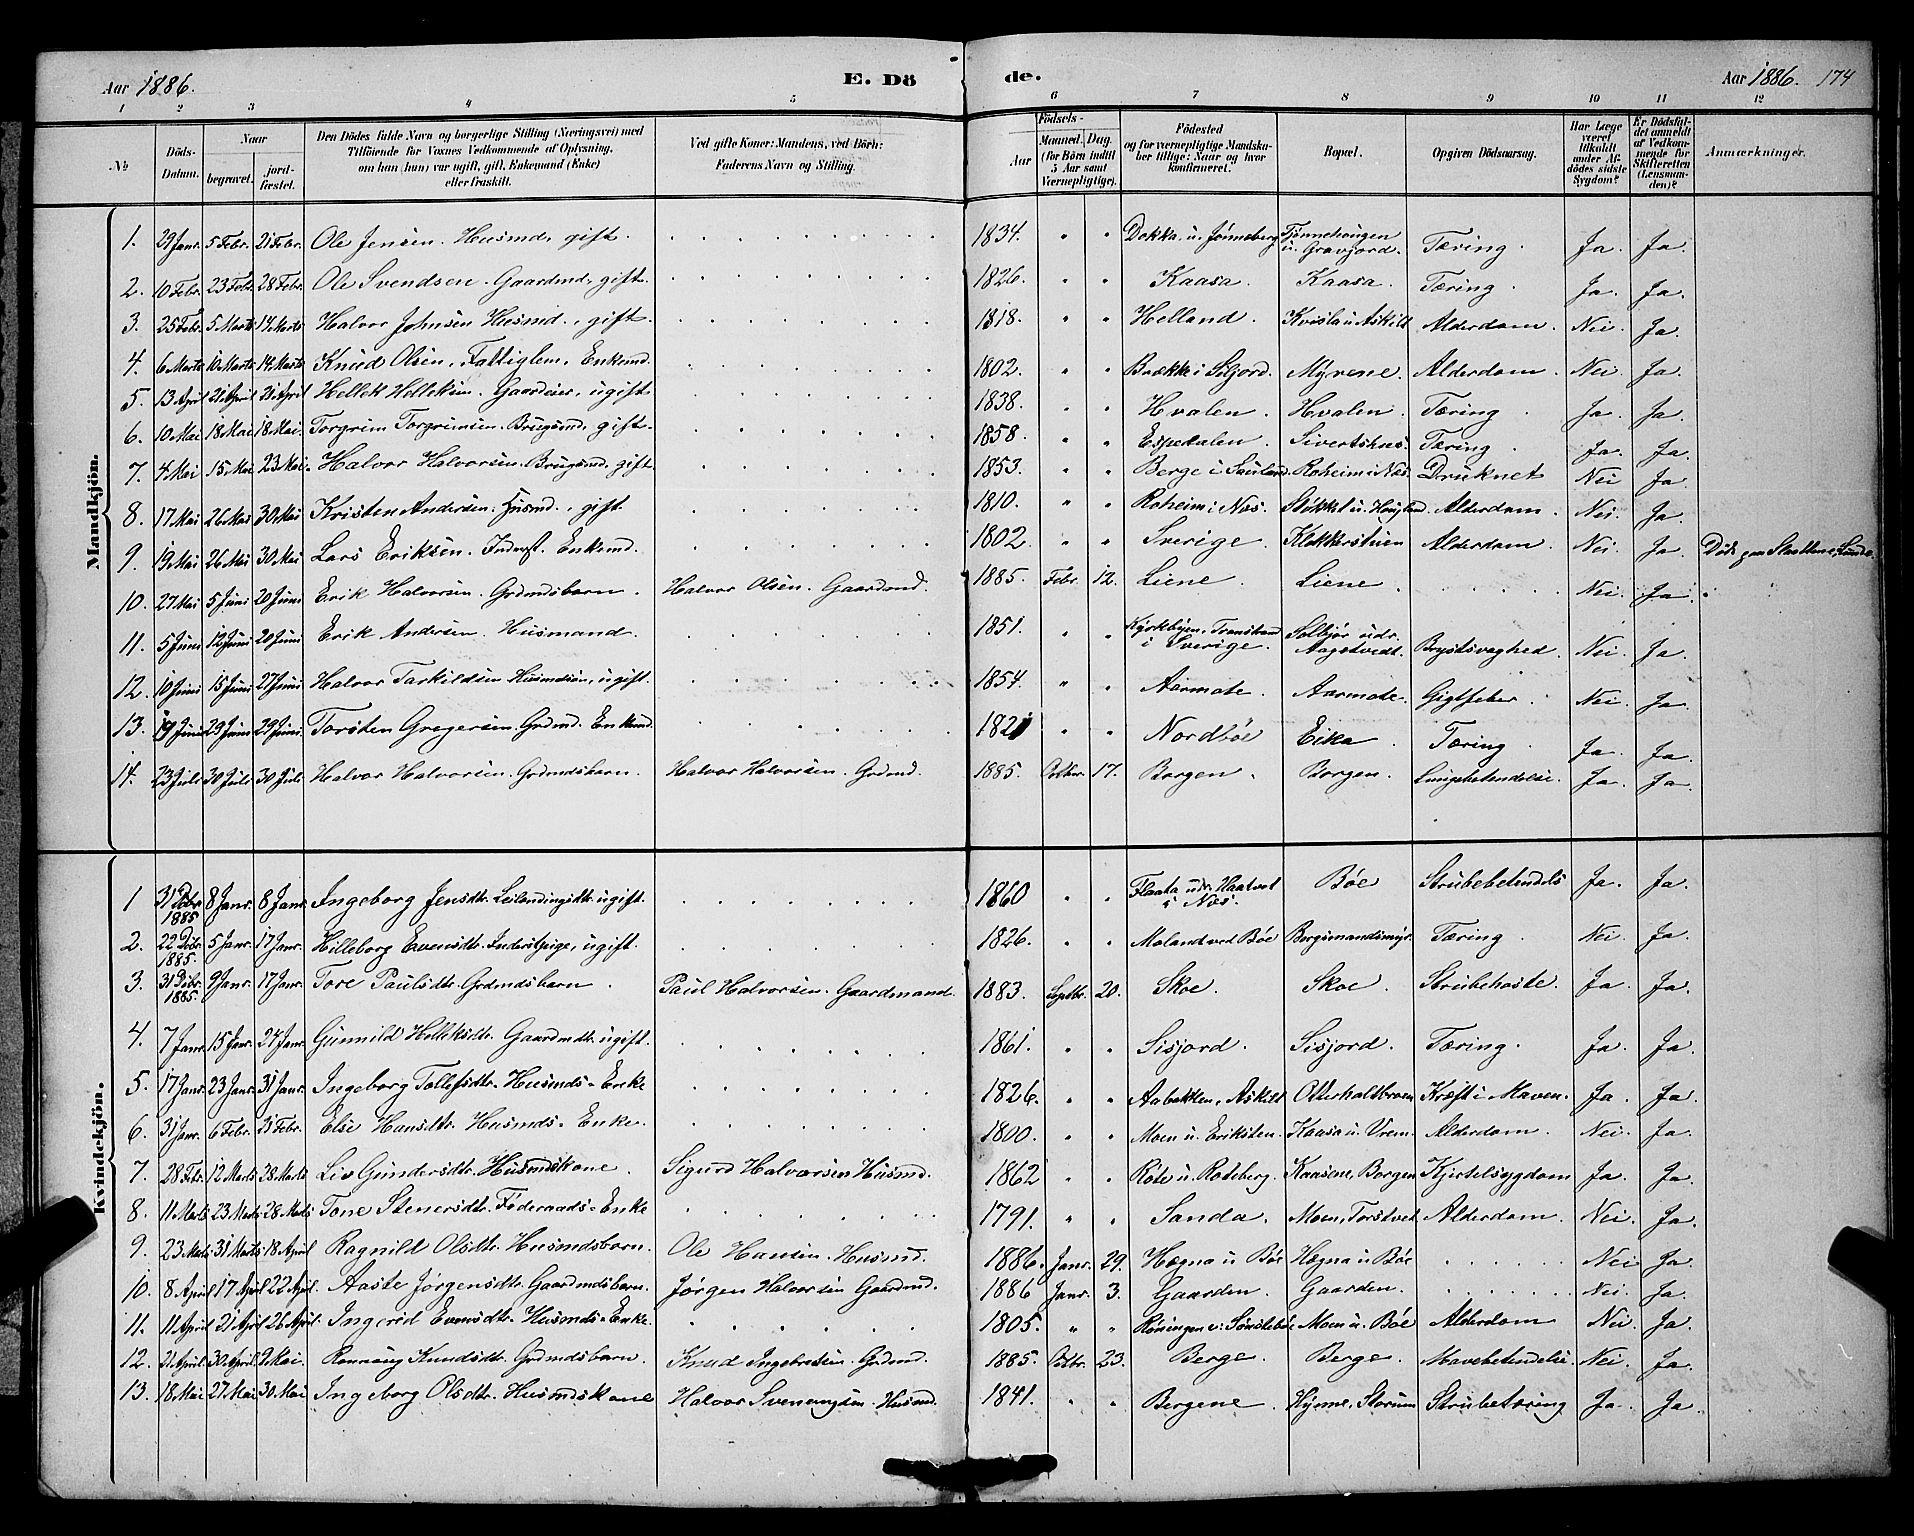 SAKO, Bø kirkebøker, G/Ga/L0005: Klokkerbok nr. 5, 1883-1897, s. 174